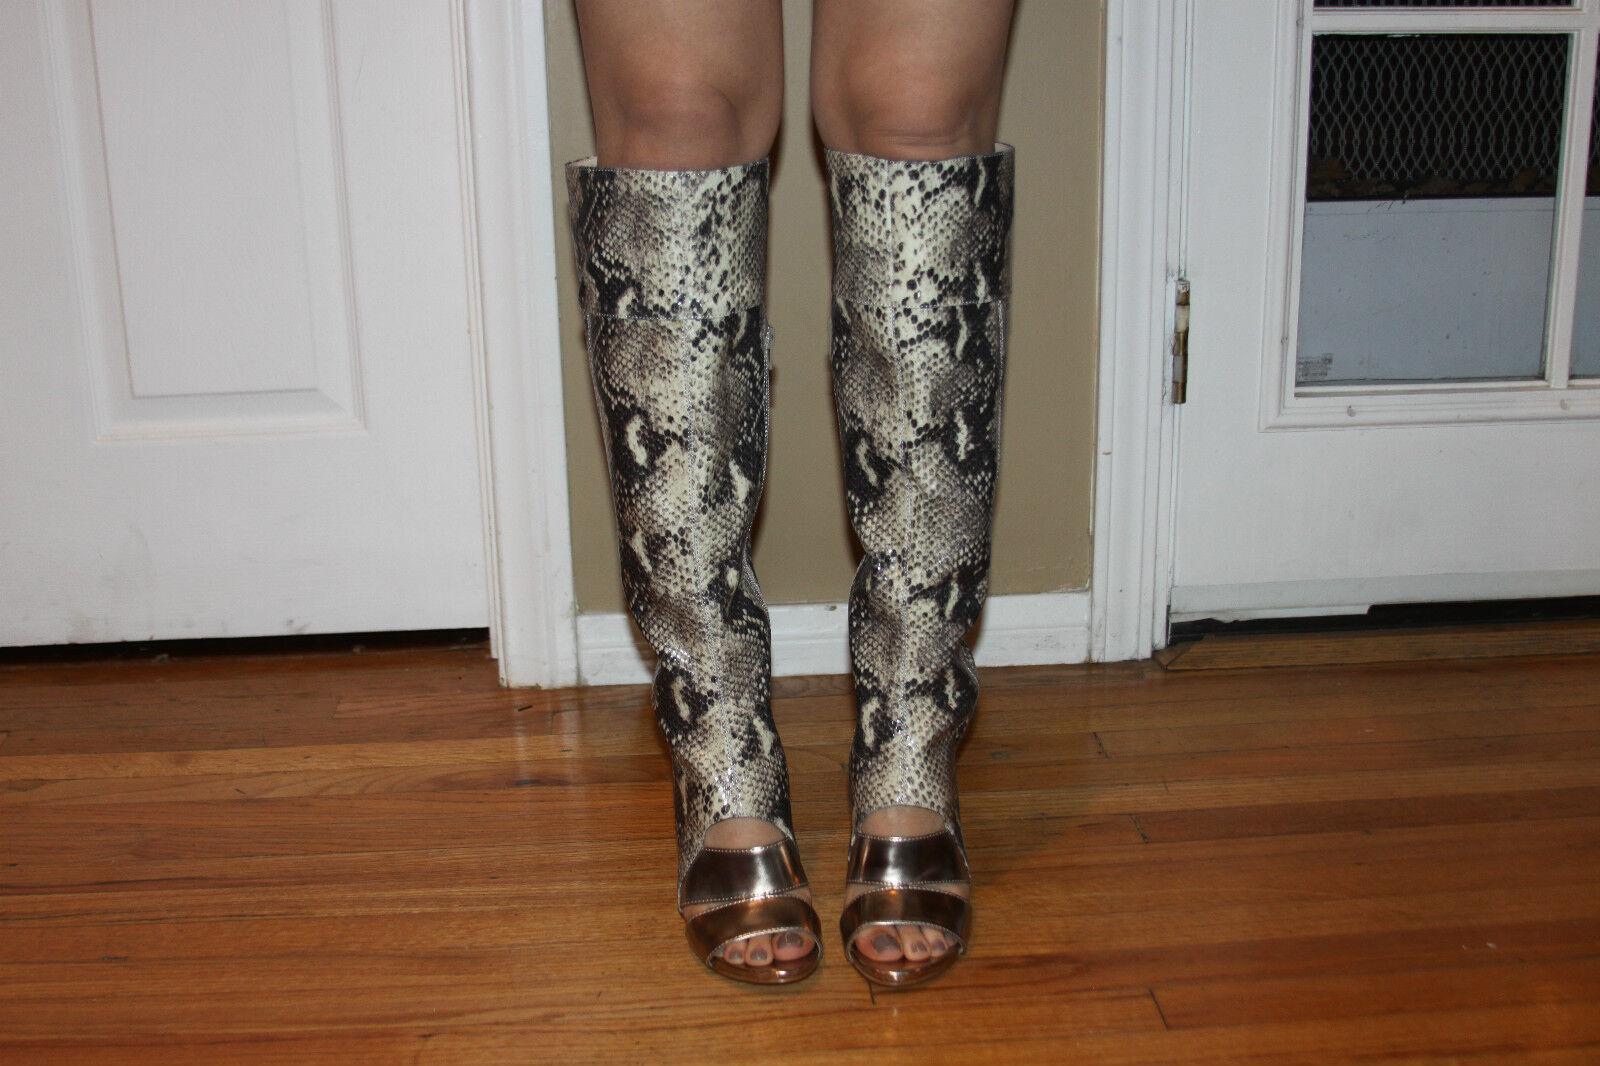 Guess the Condolan3 Open Toe Synthetic Over the Guess Knee Boot SZ 6 ccba4e